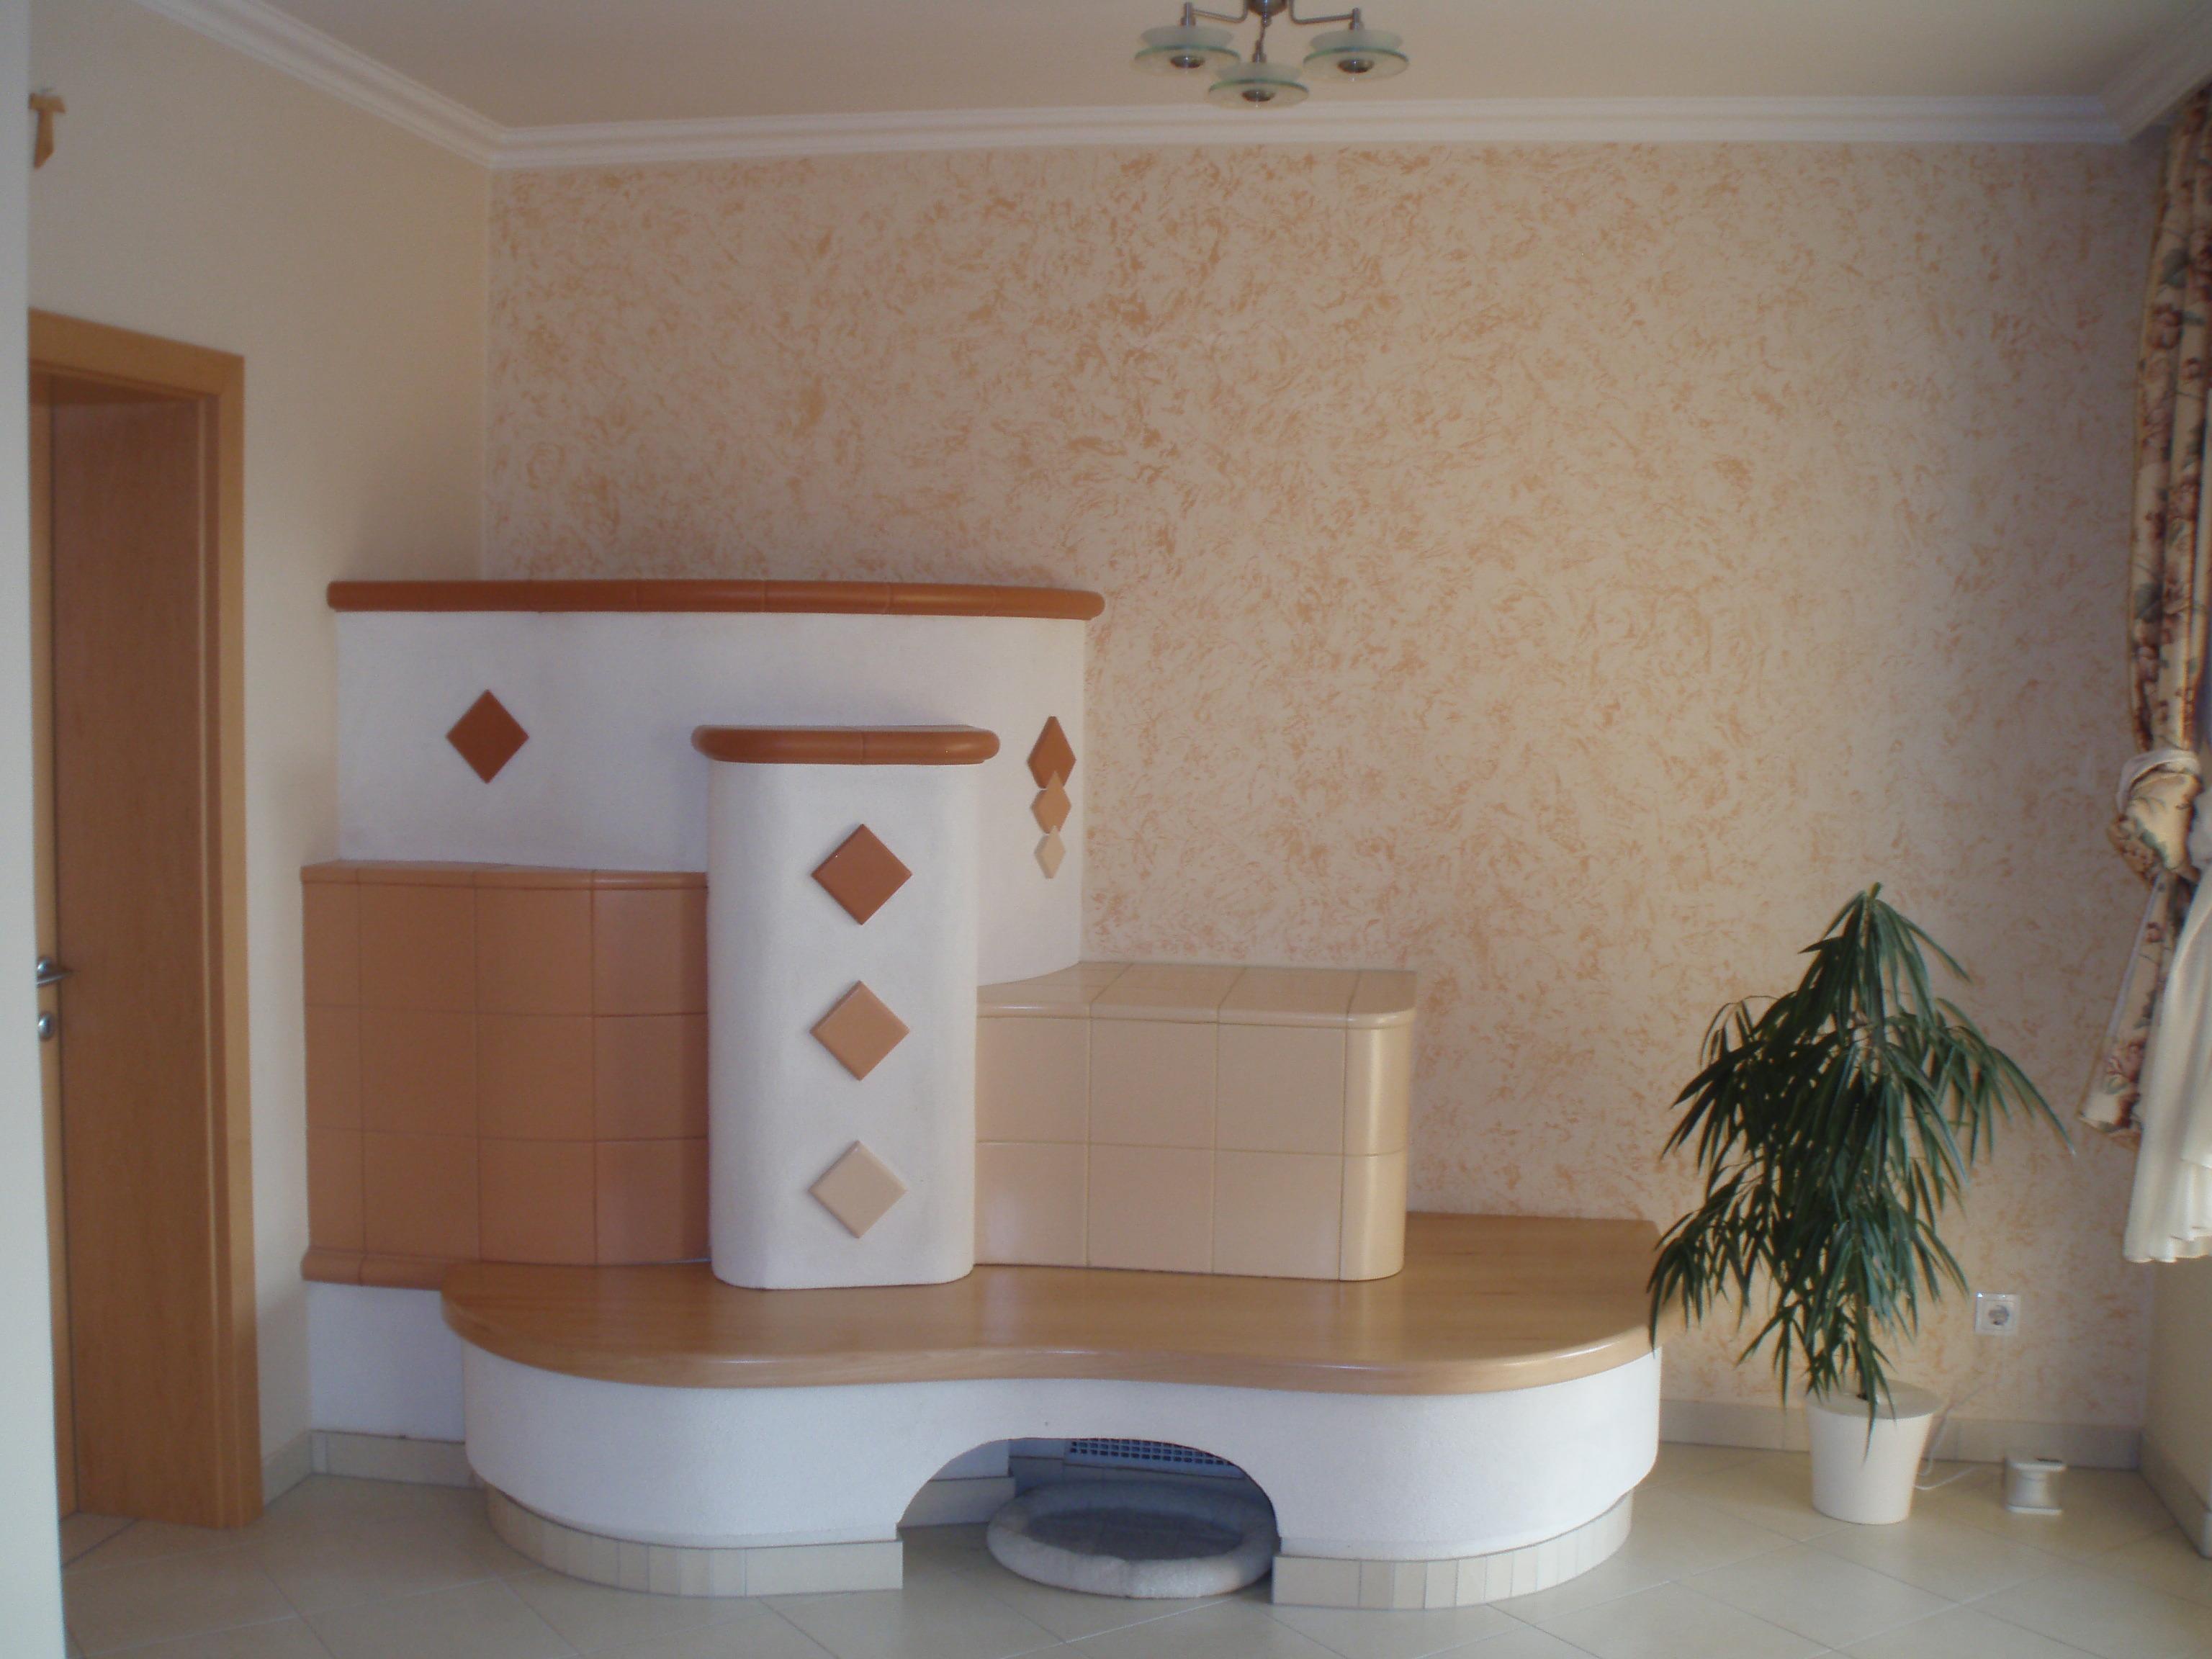 wohnraumgestaltung bilder news infos aus dem web. Black Bedroom Furniture Sets. Home Design Ideas